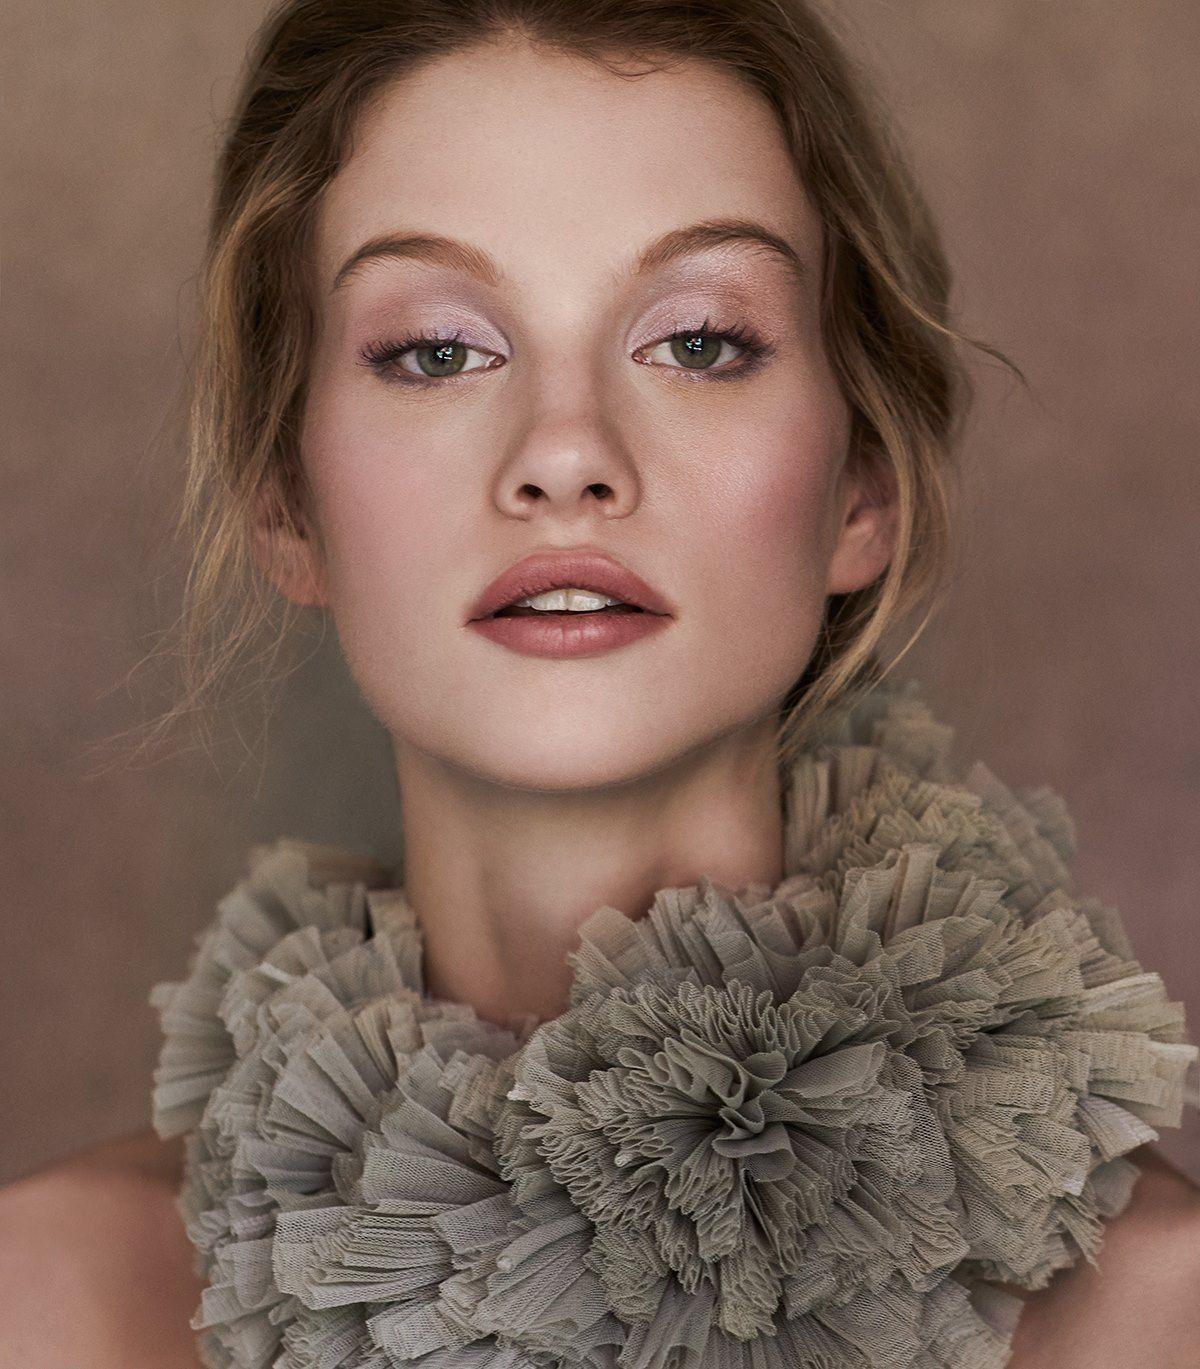 The Fashion Series by Lara Jade Fashion photography